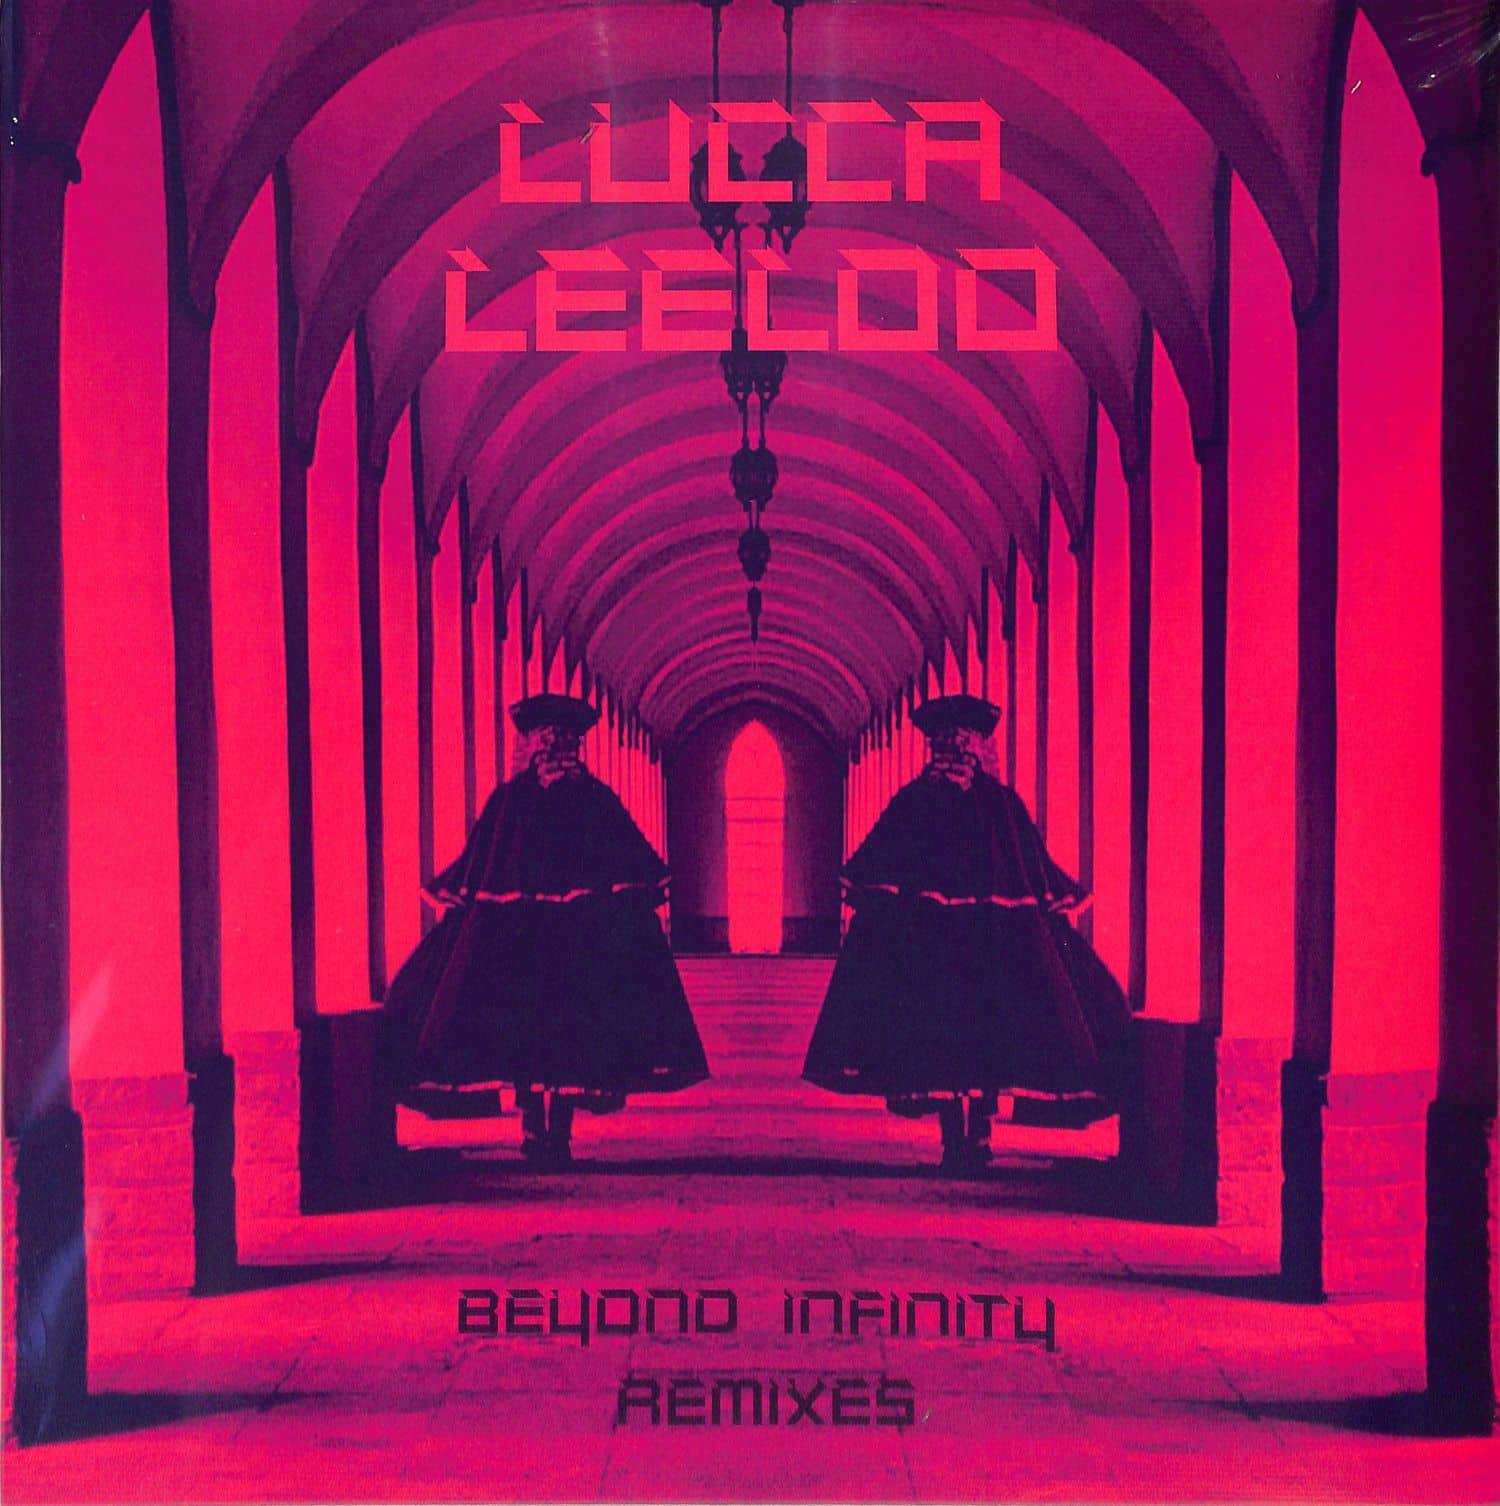 Lucca Leeloo - BEYOND INFINITY REMIXES